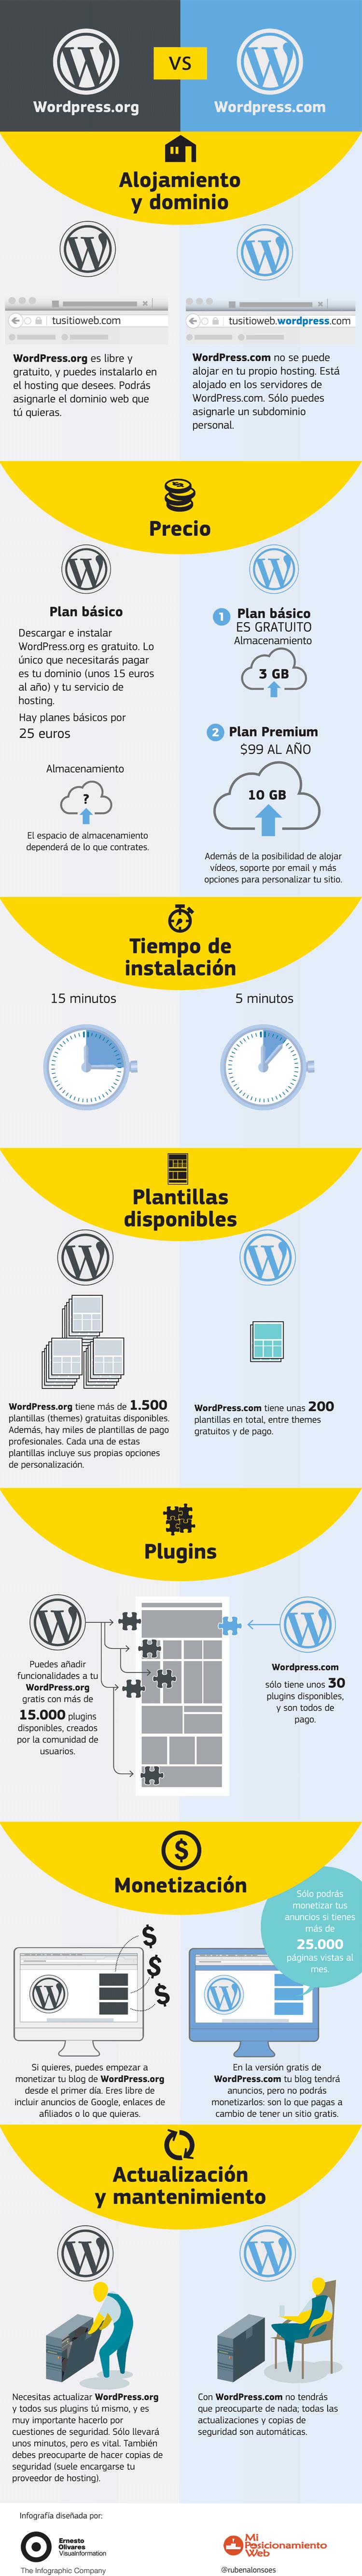 Diferencias wordpress-com-vs-wordpress-org